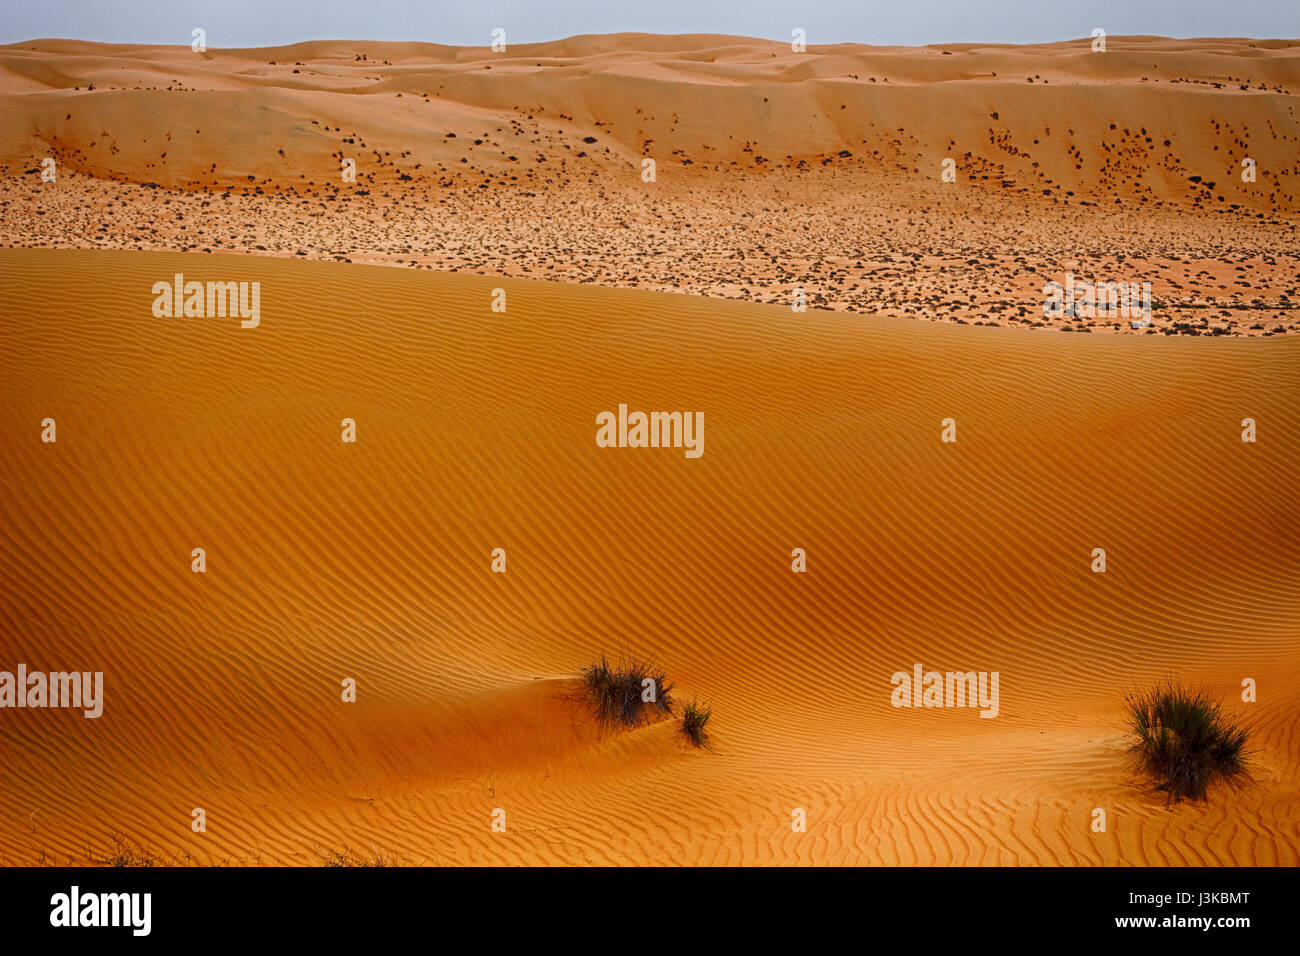 View across Wahiba Sands (Ramlat al Wahaybah) in Oman - Sharqiya Sands Stock Photo